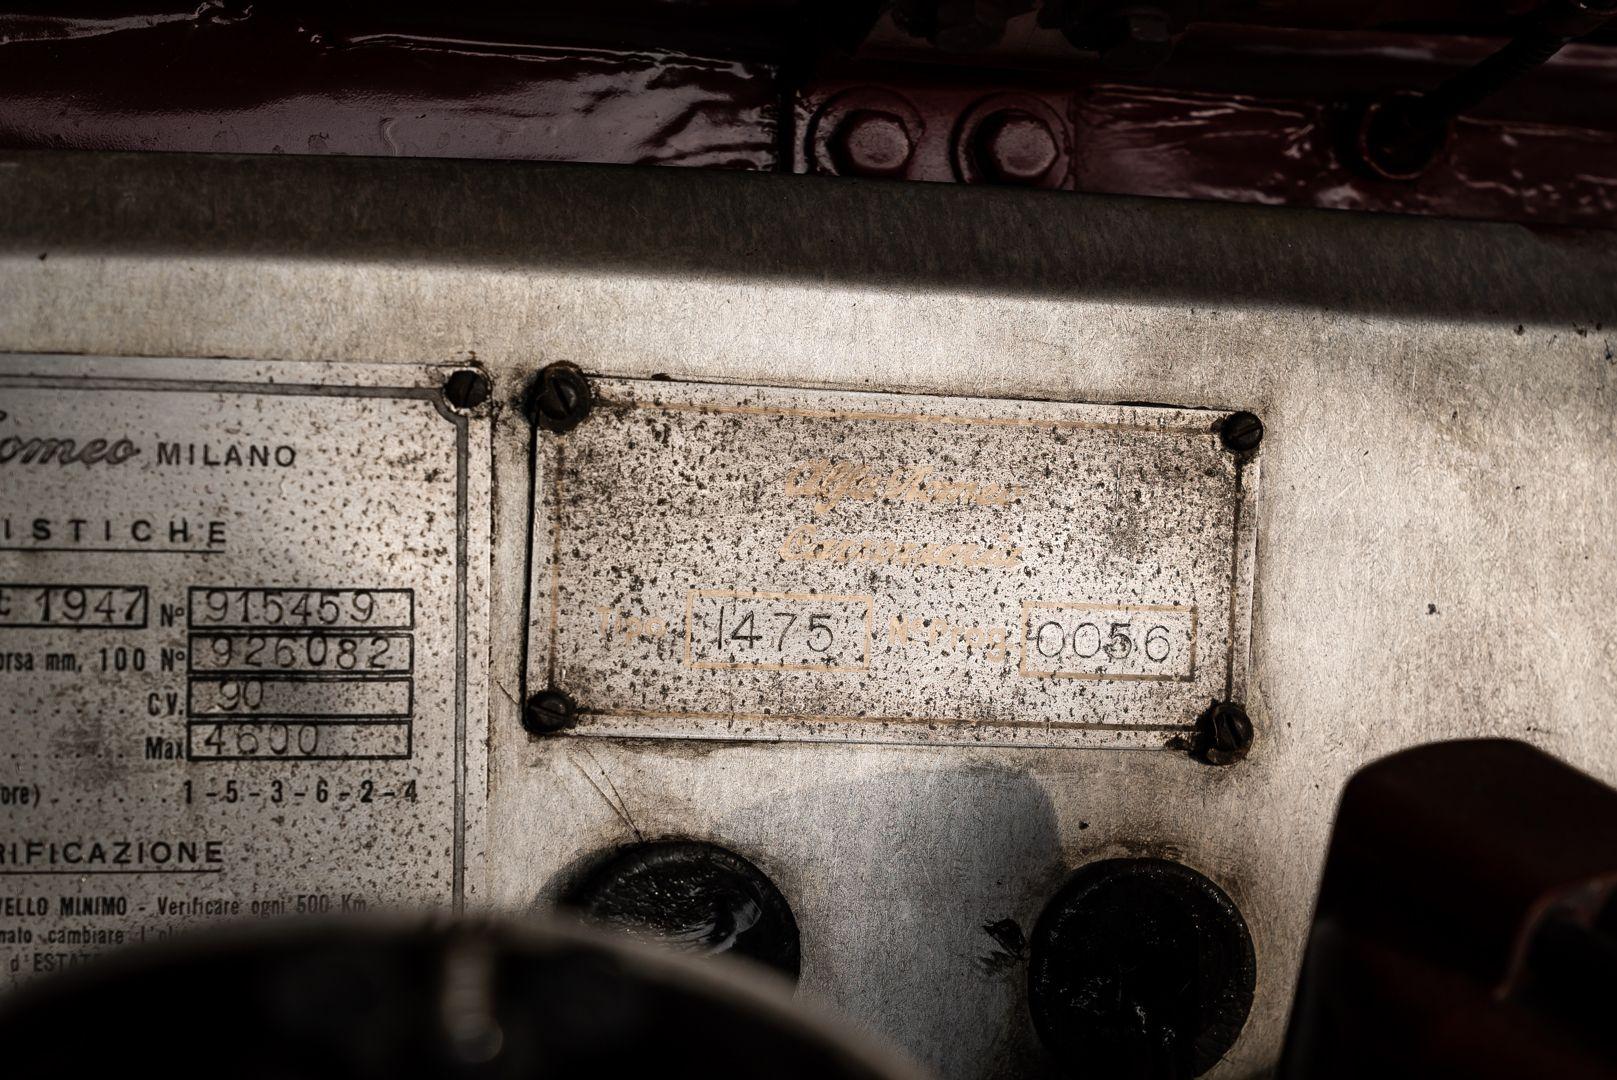 1947 Alfa Romeo Freccia d'oro 6C 2500 Sport 61721